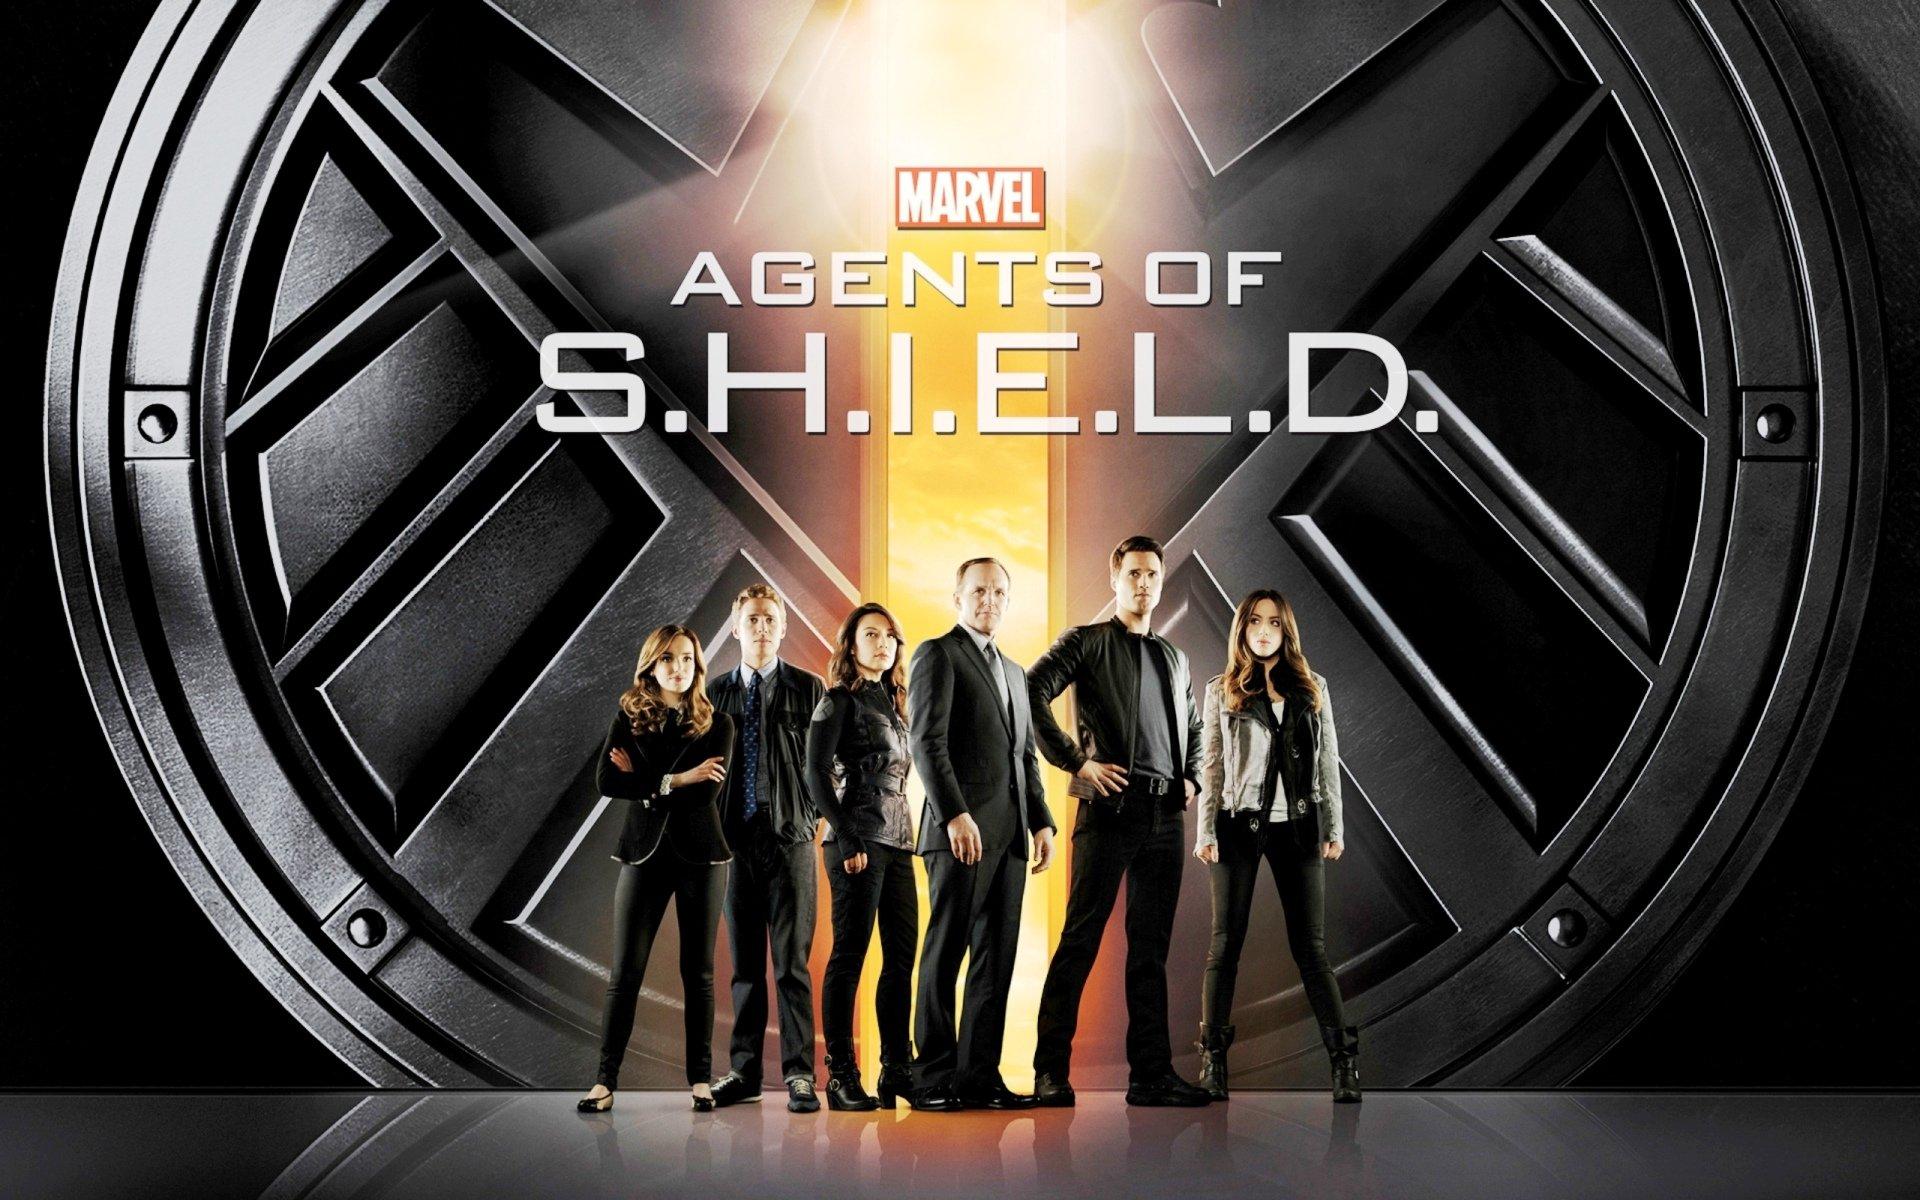 [39+] Agents of SHIELD Wallpapers HD on WallpaperSafari